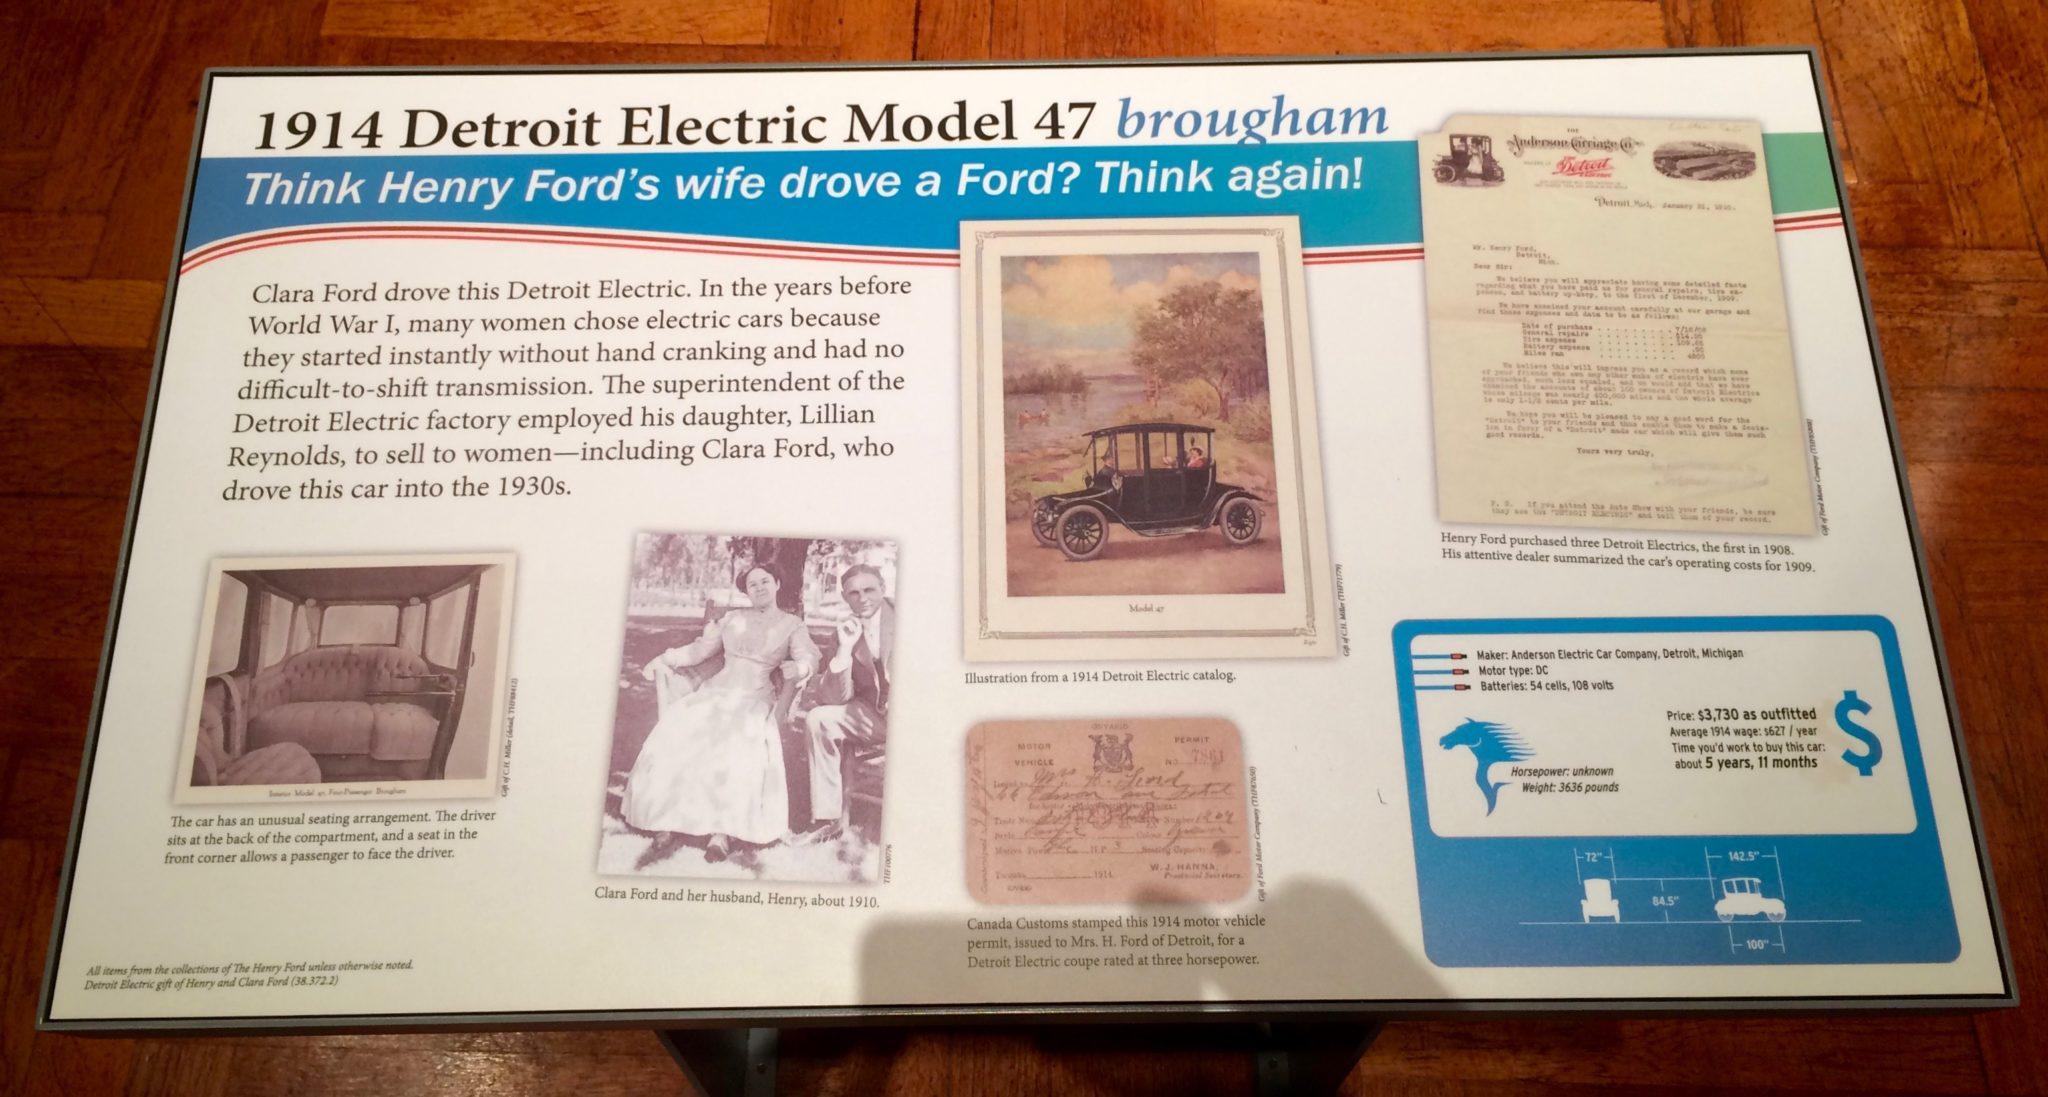 Plaque about Clara Fordu0027s electric car Detroit Electric Model 47 & Great Lake Trip u2013 Day 13 u2013 Michigan | Randall Soules markmcfarlin.com